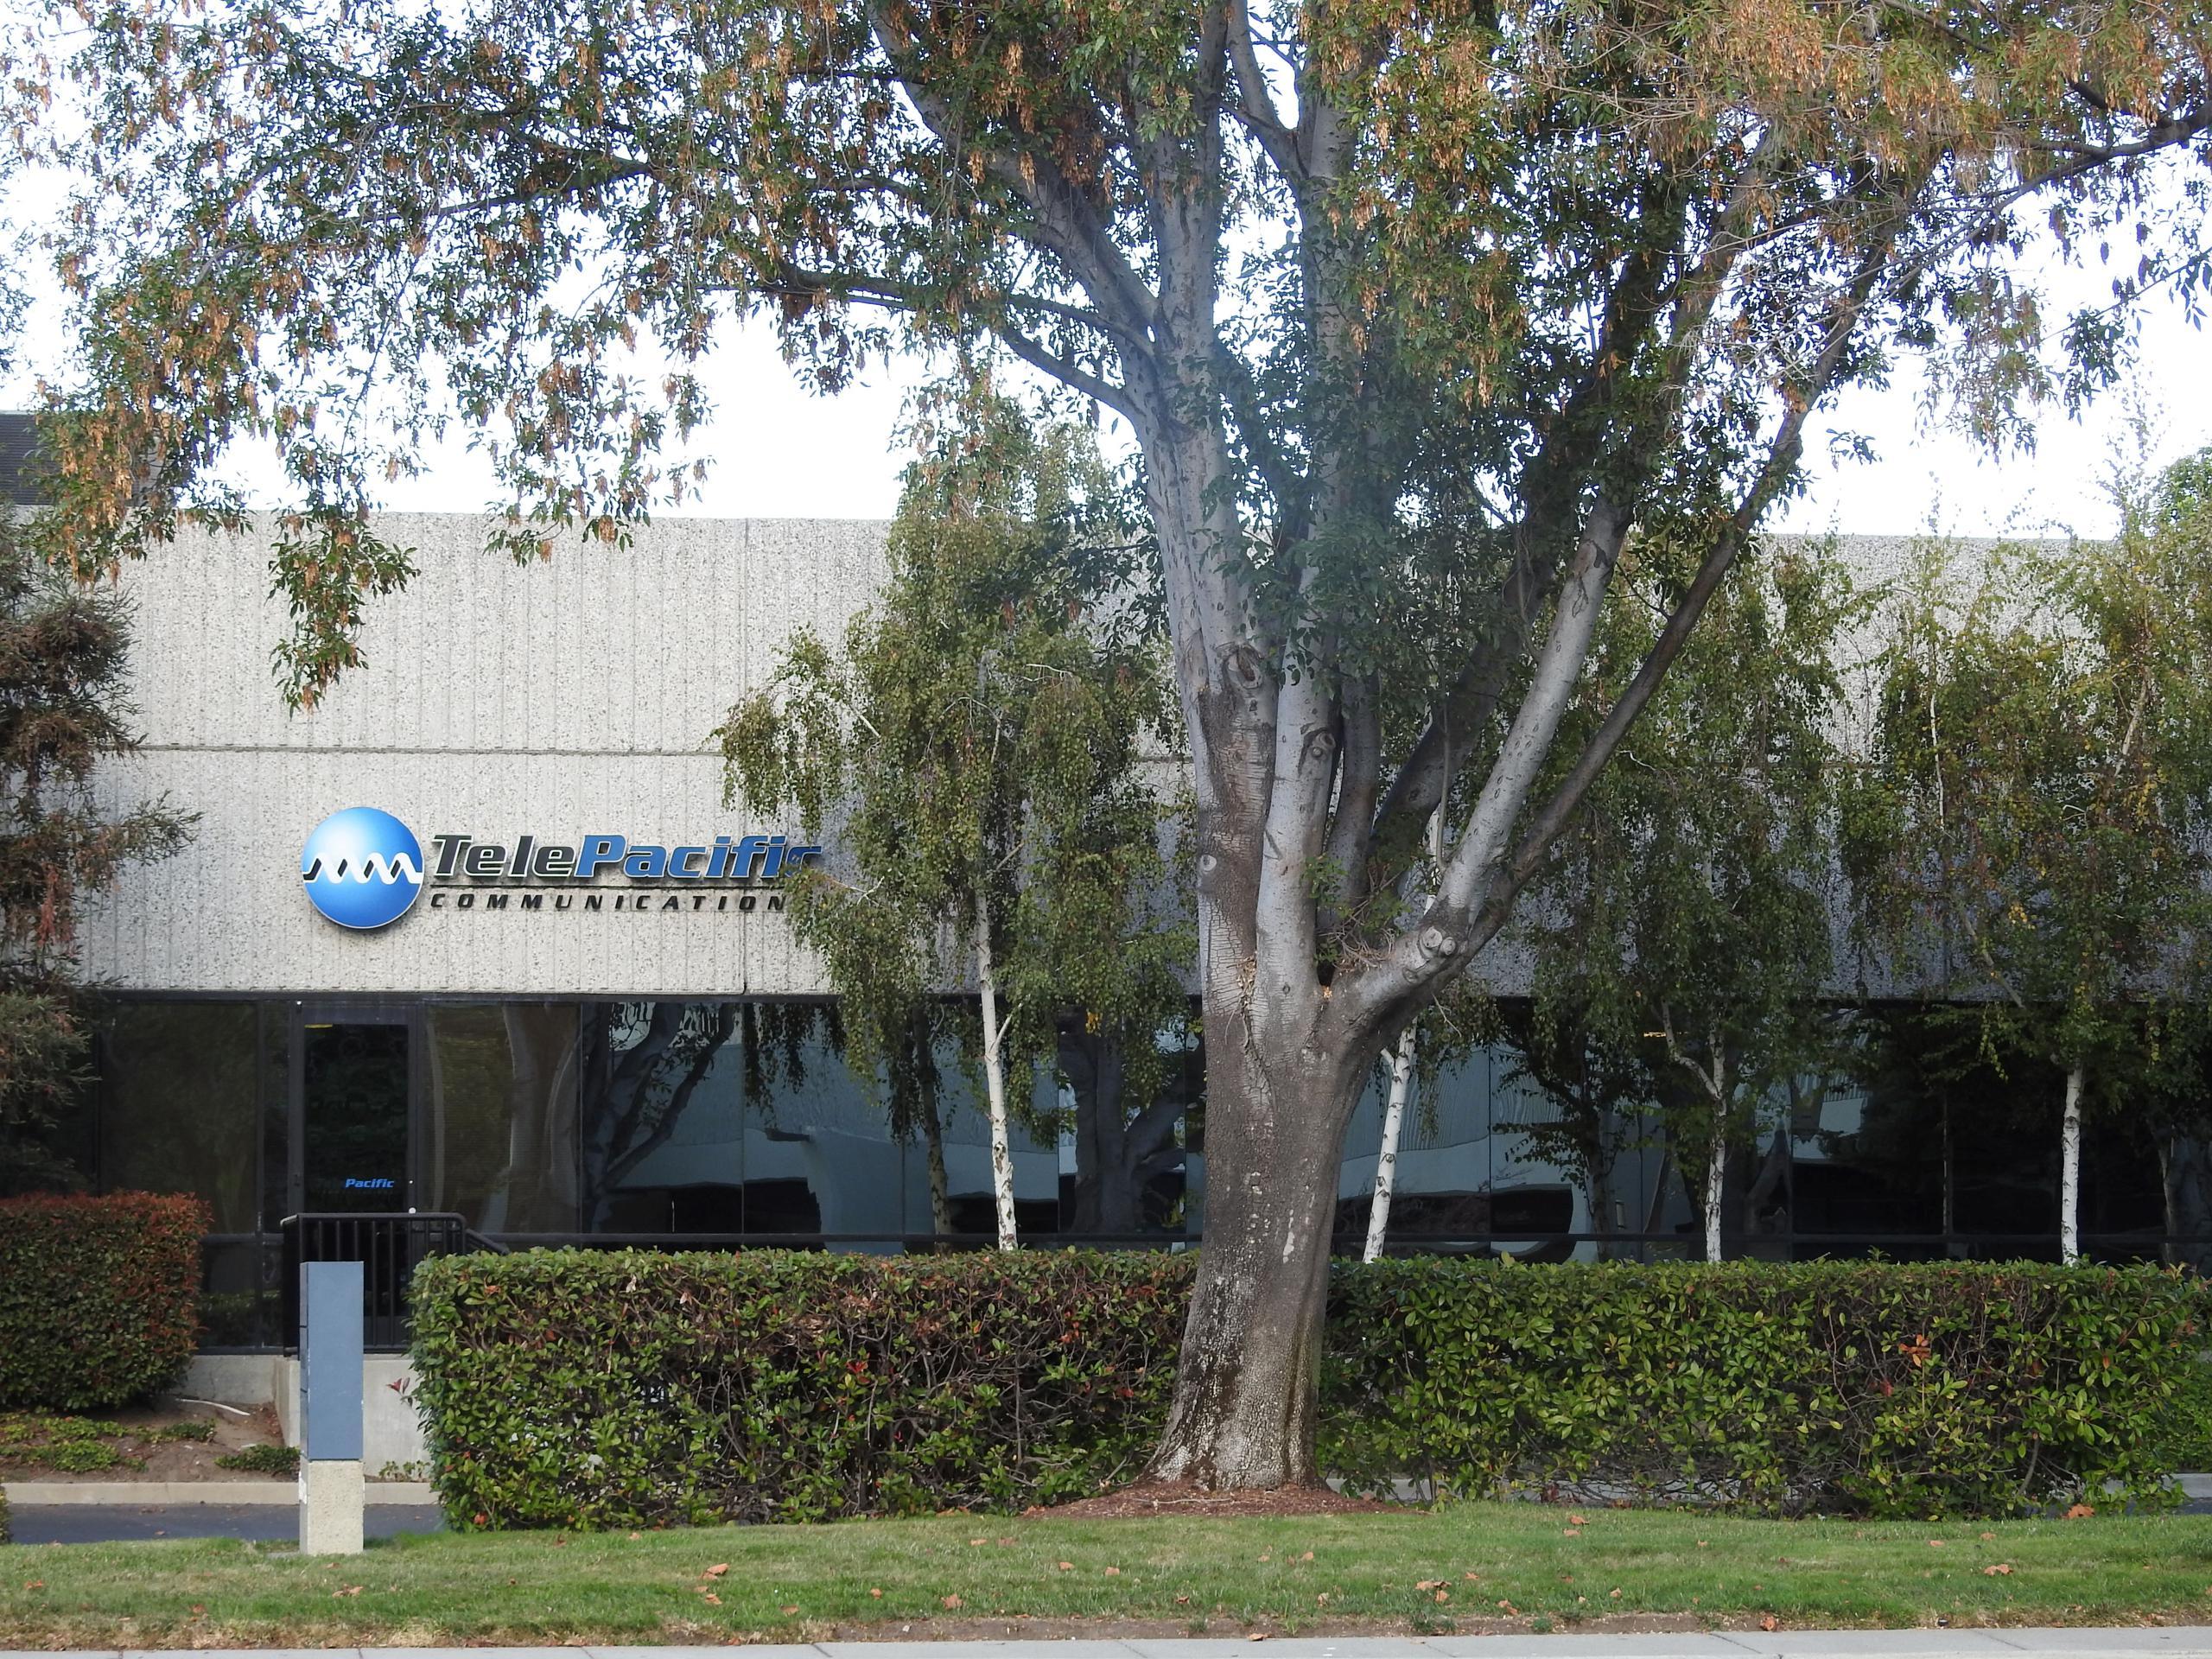 TelePacific's office in San Jose, California.